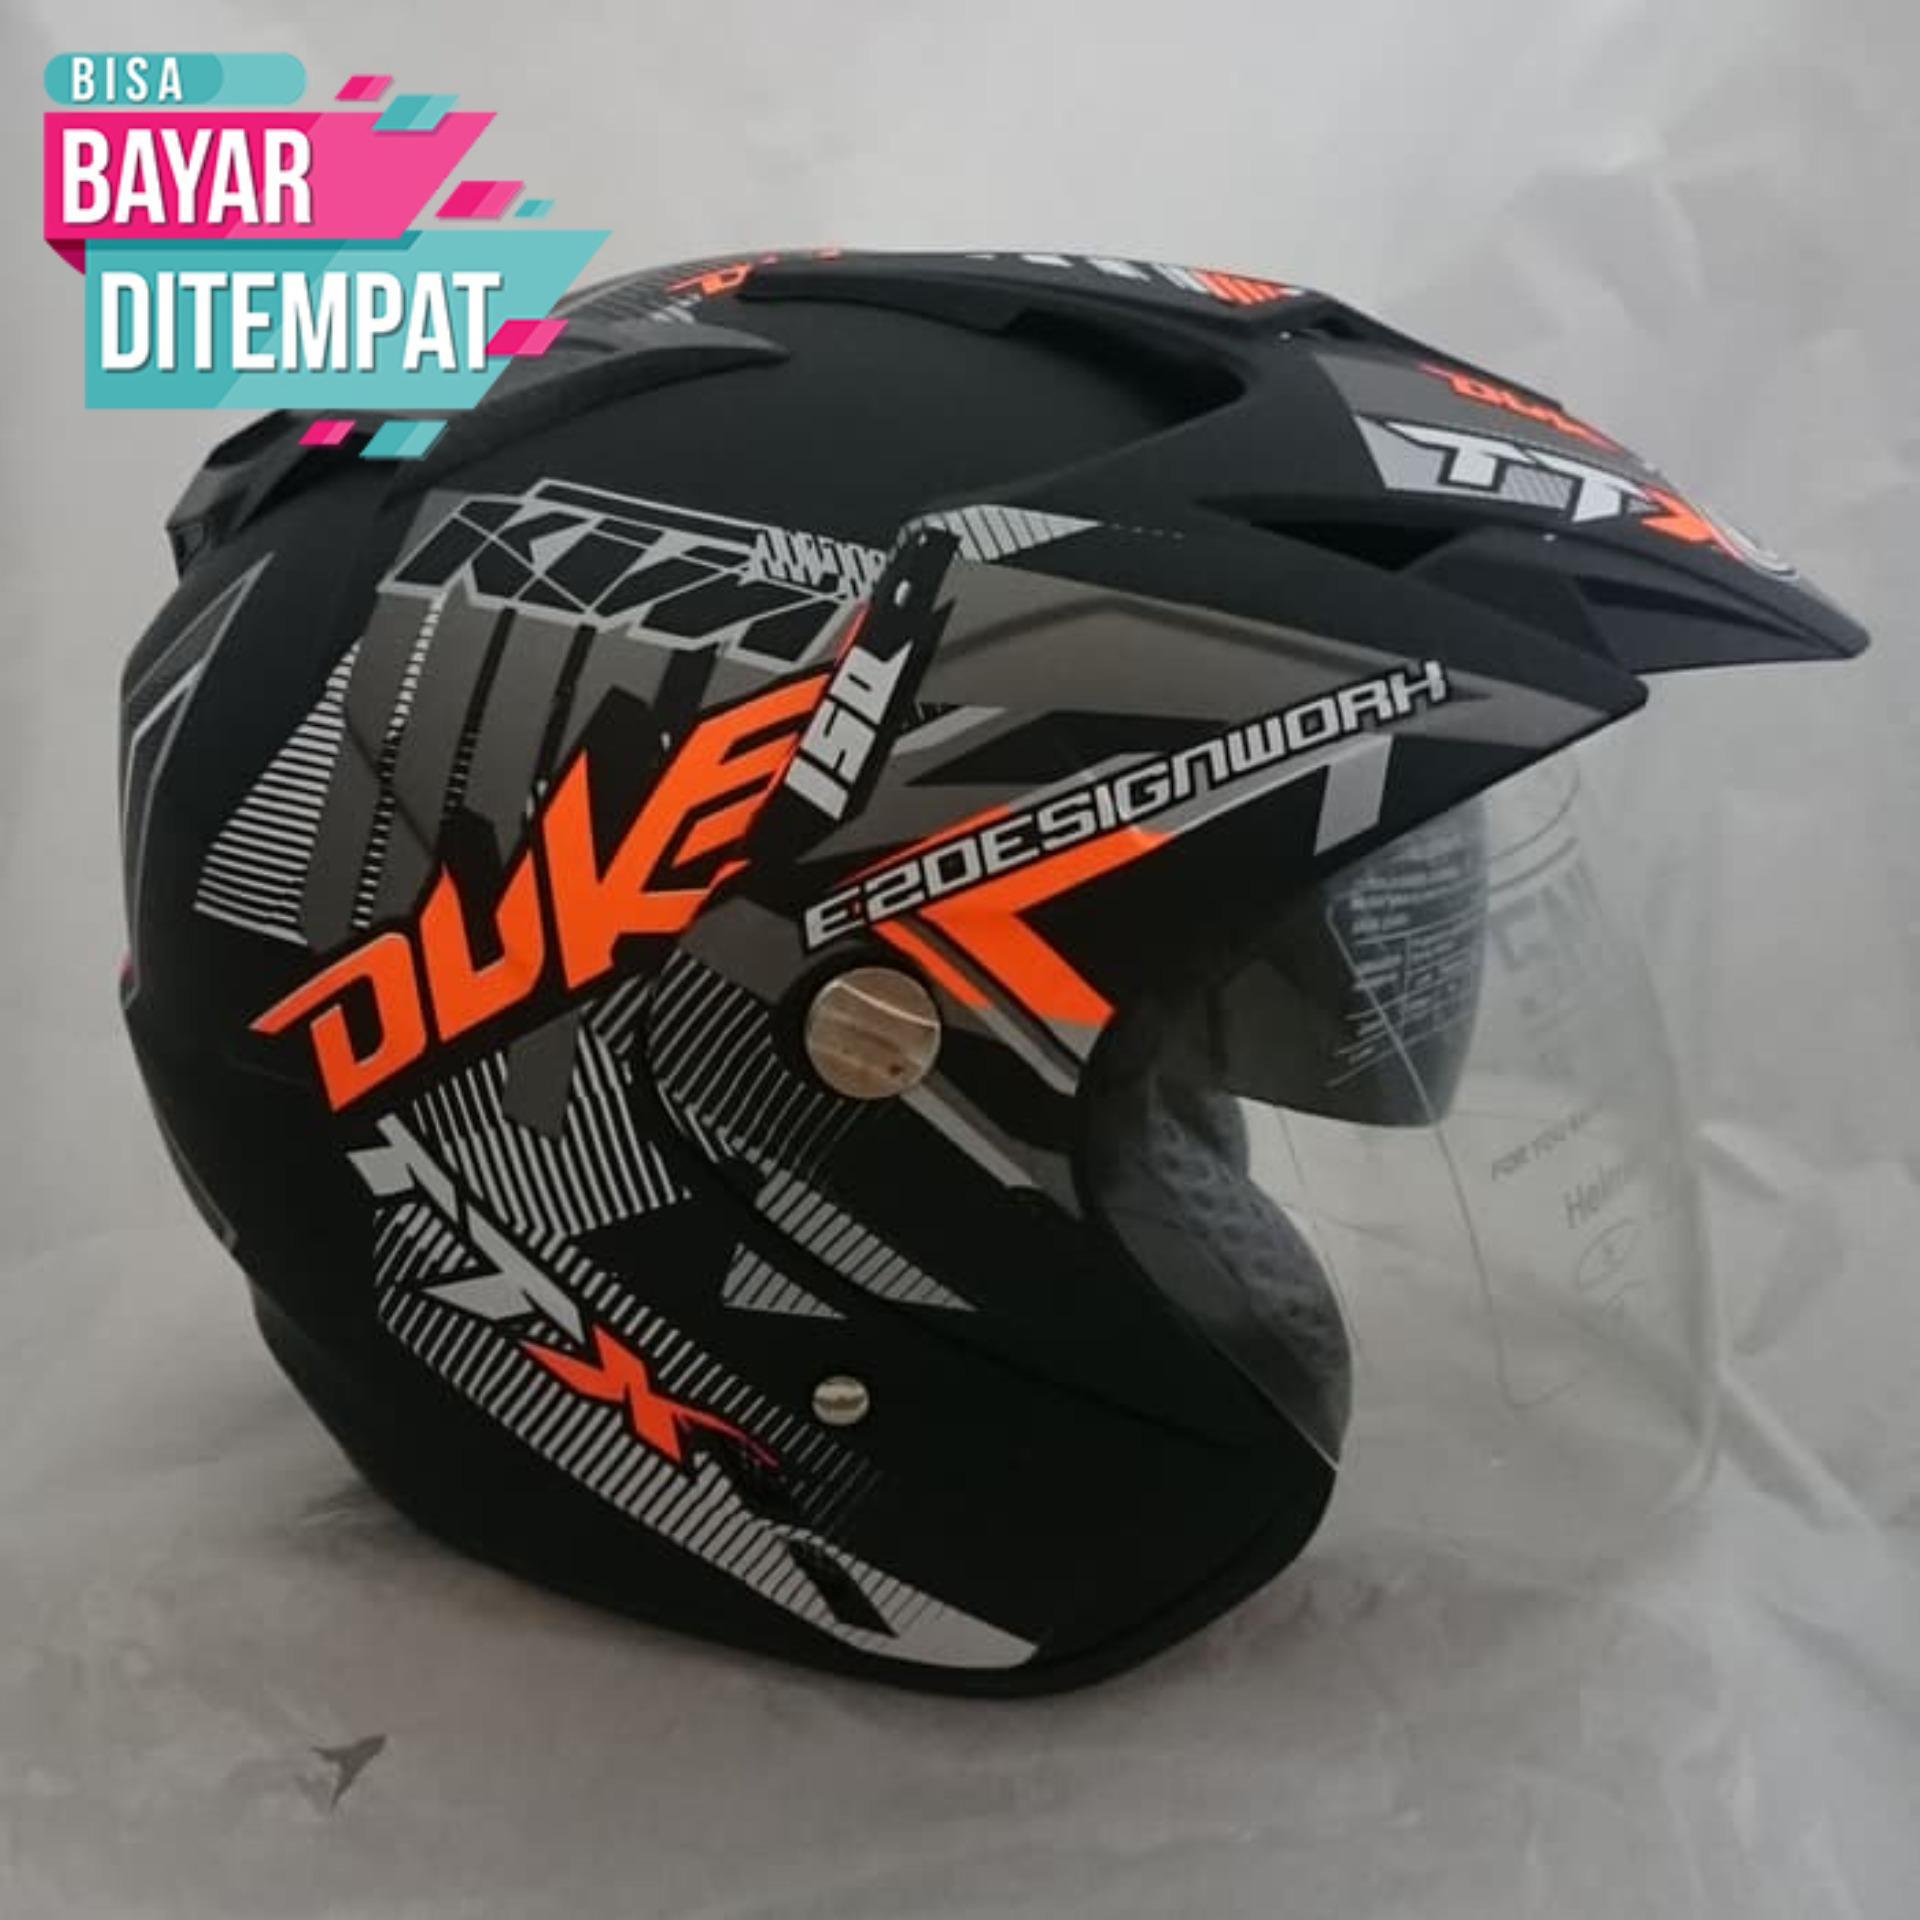 Helm DMN BXP 2 kaca jp-7 (Double visor) Duke orange